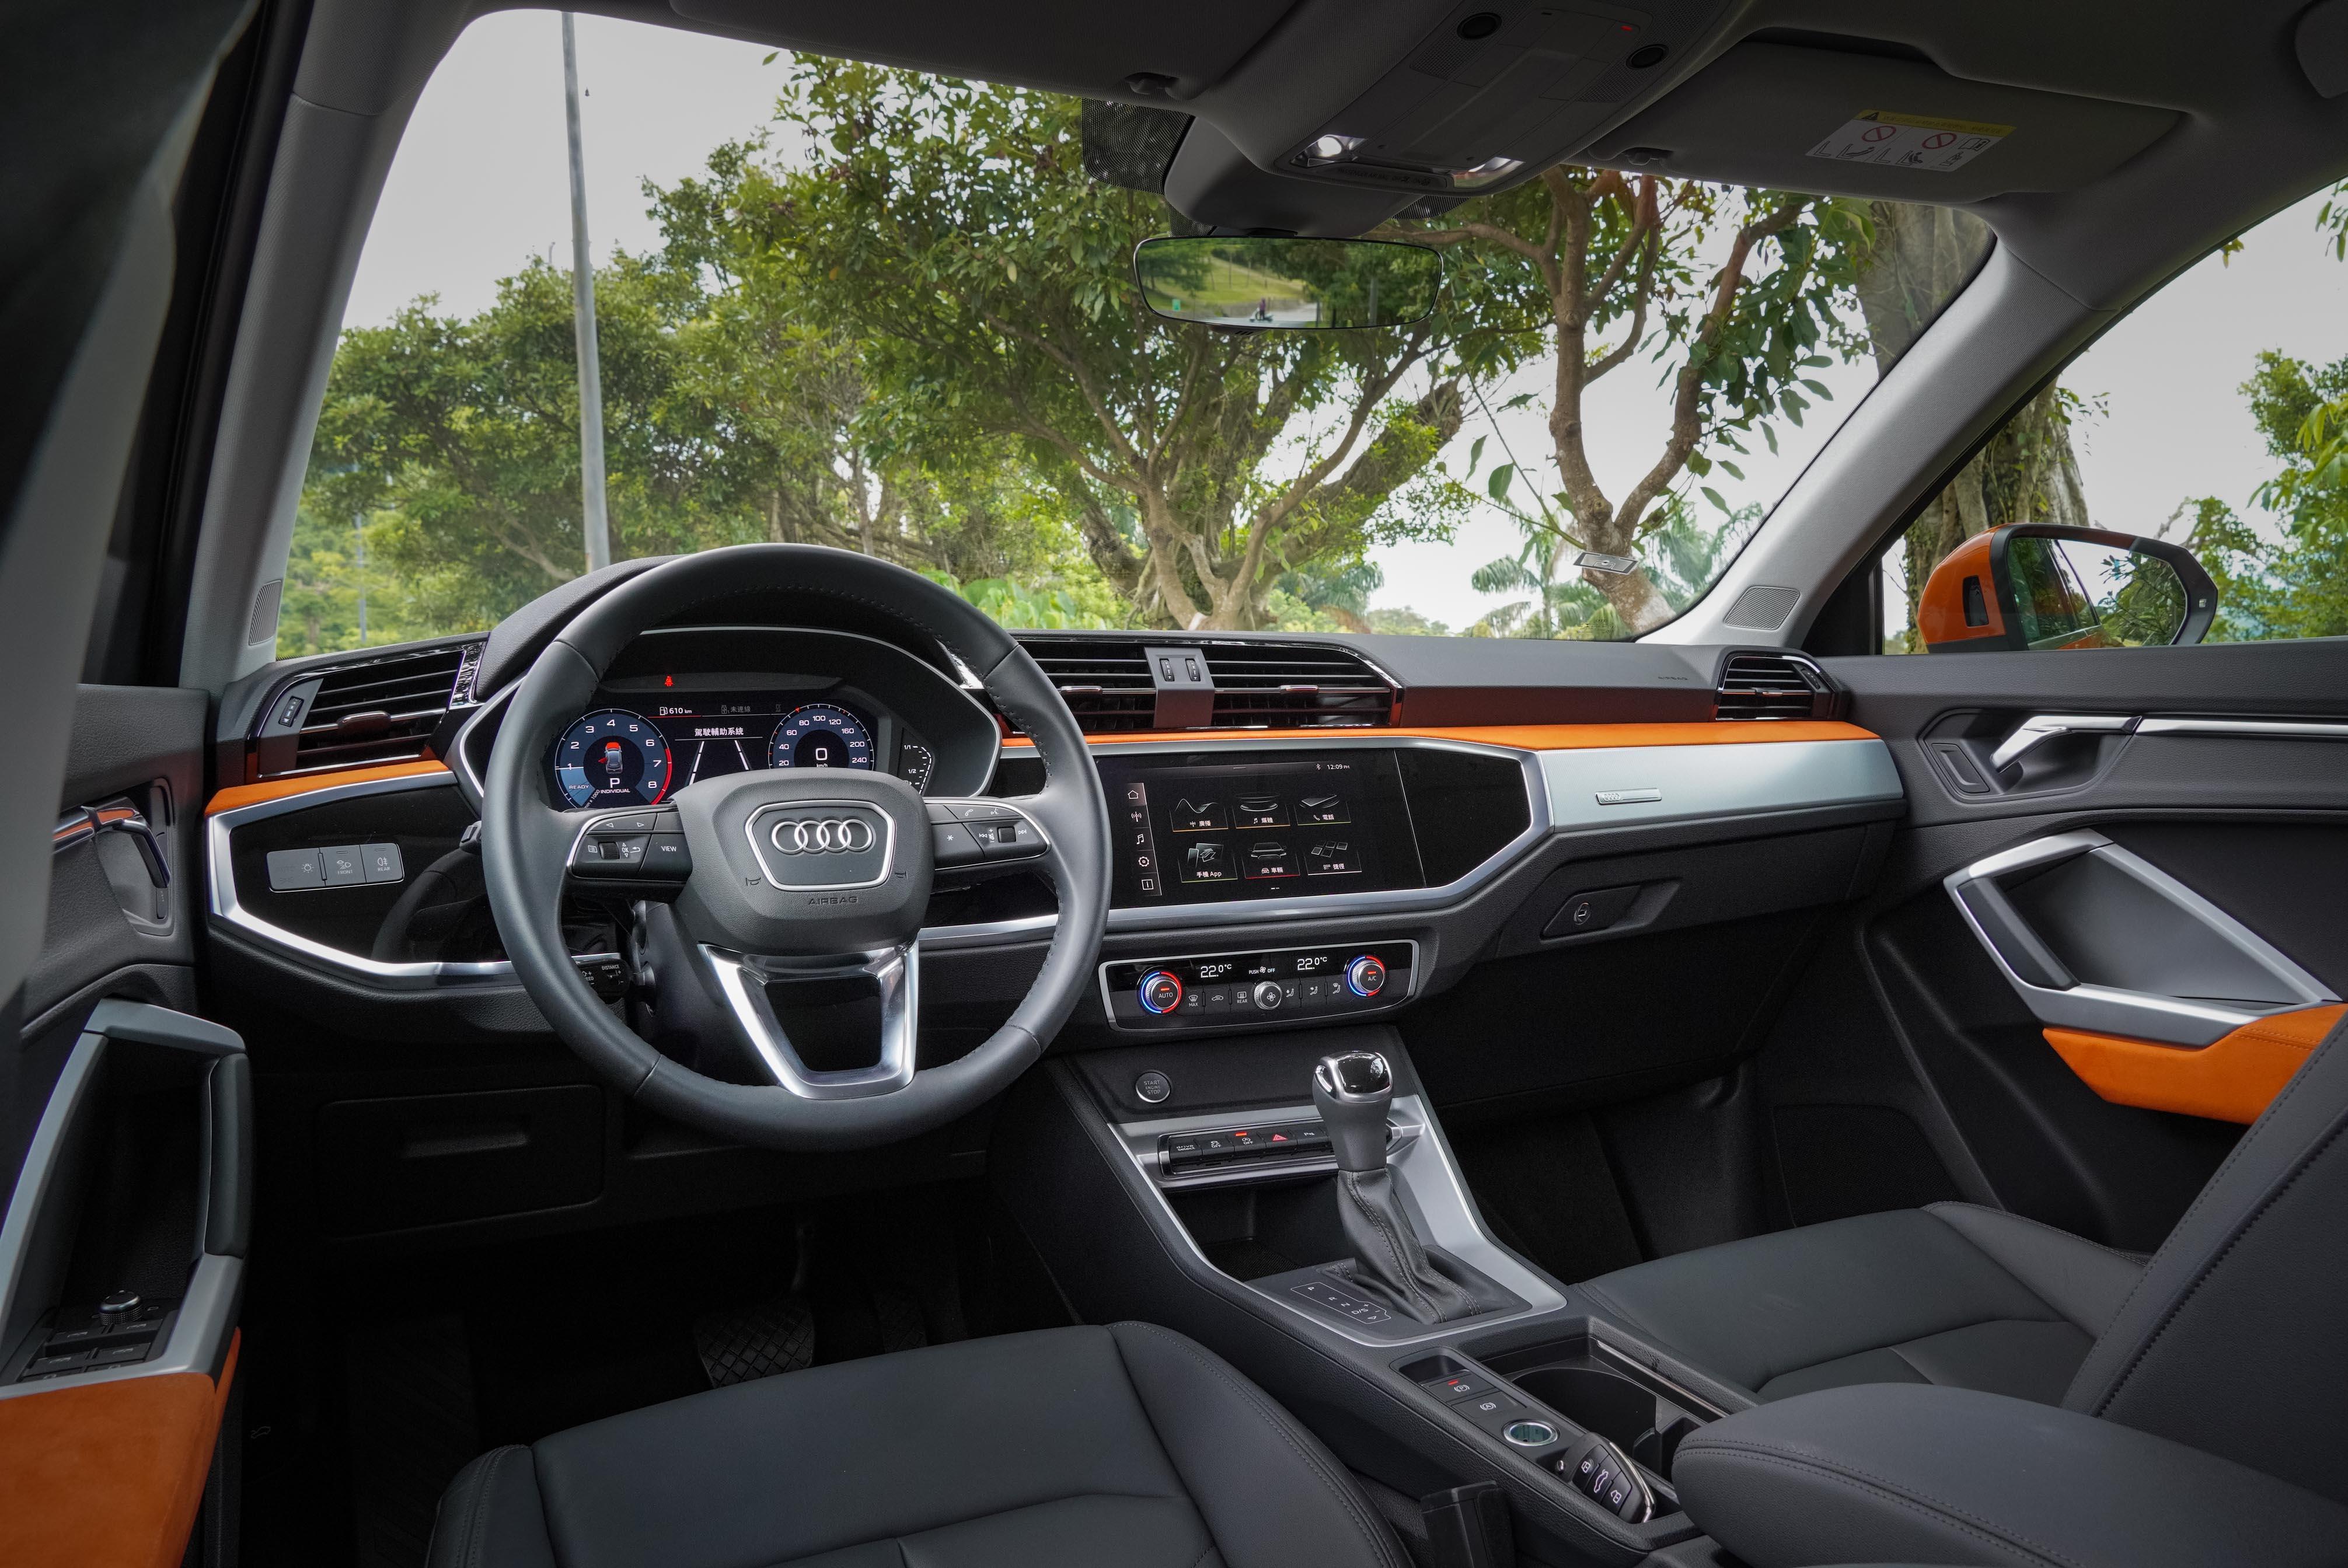 advanced 以上版本標配 Alcantara 車室套件及鋁質內裝套件。音響採用 10 支揚聲器的 Audi sound system 環繞音響。